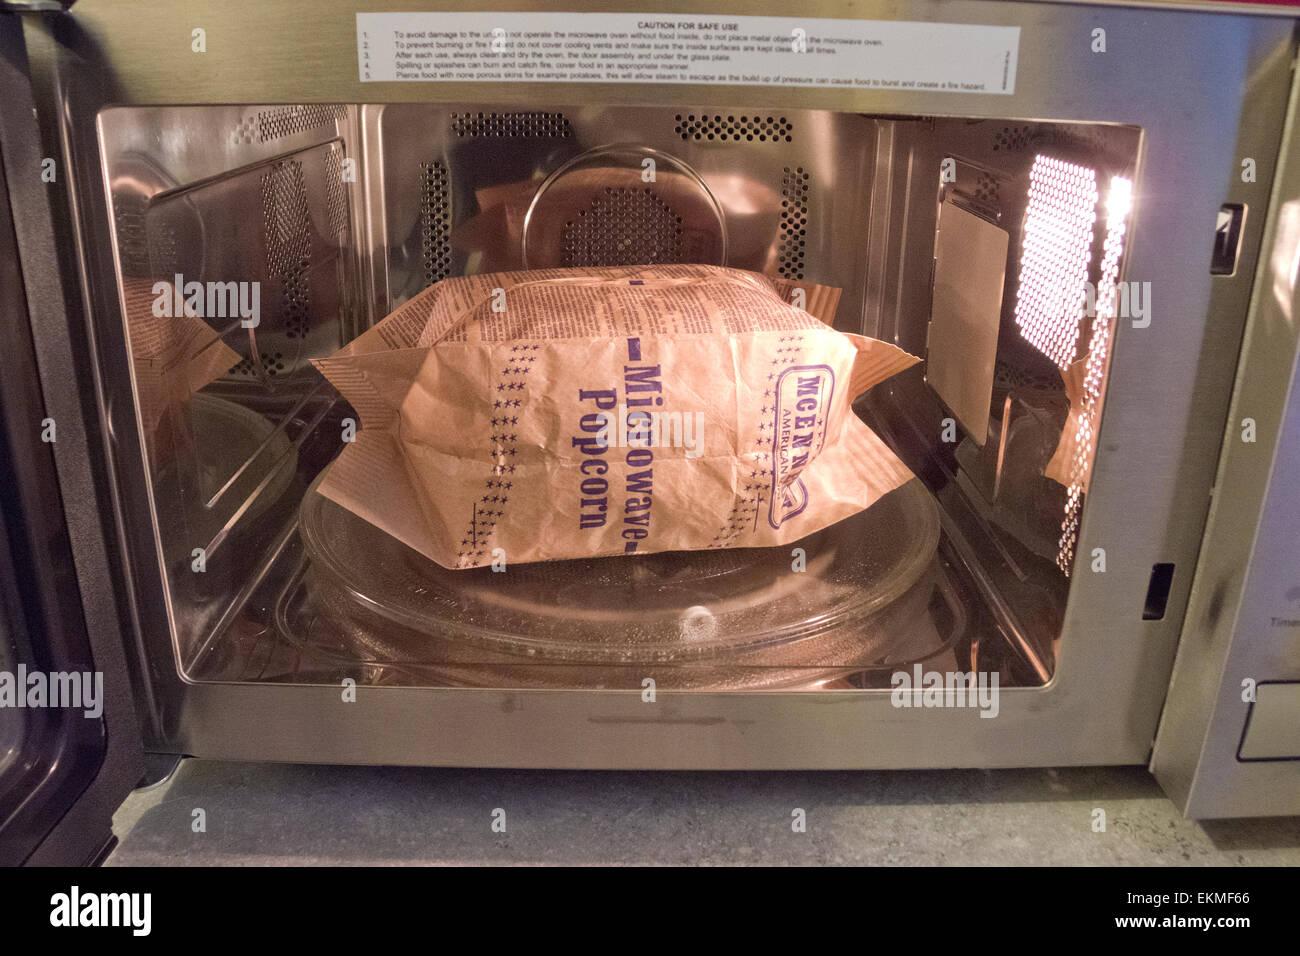 https www alamy com stock photo bag of microwave popcorn inside a microwave 80970910 html